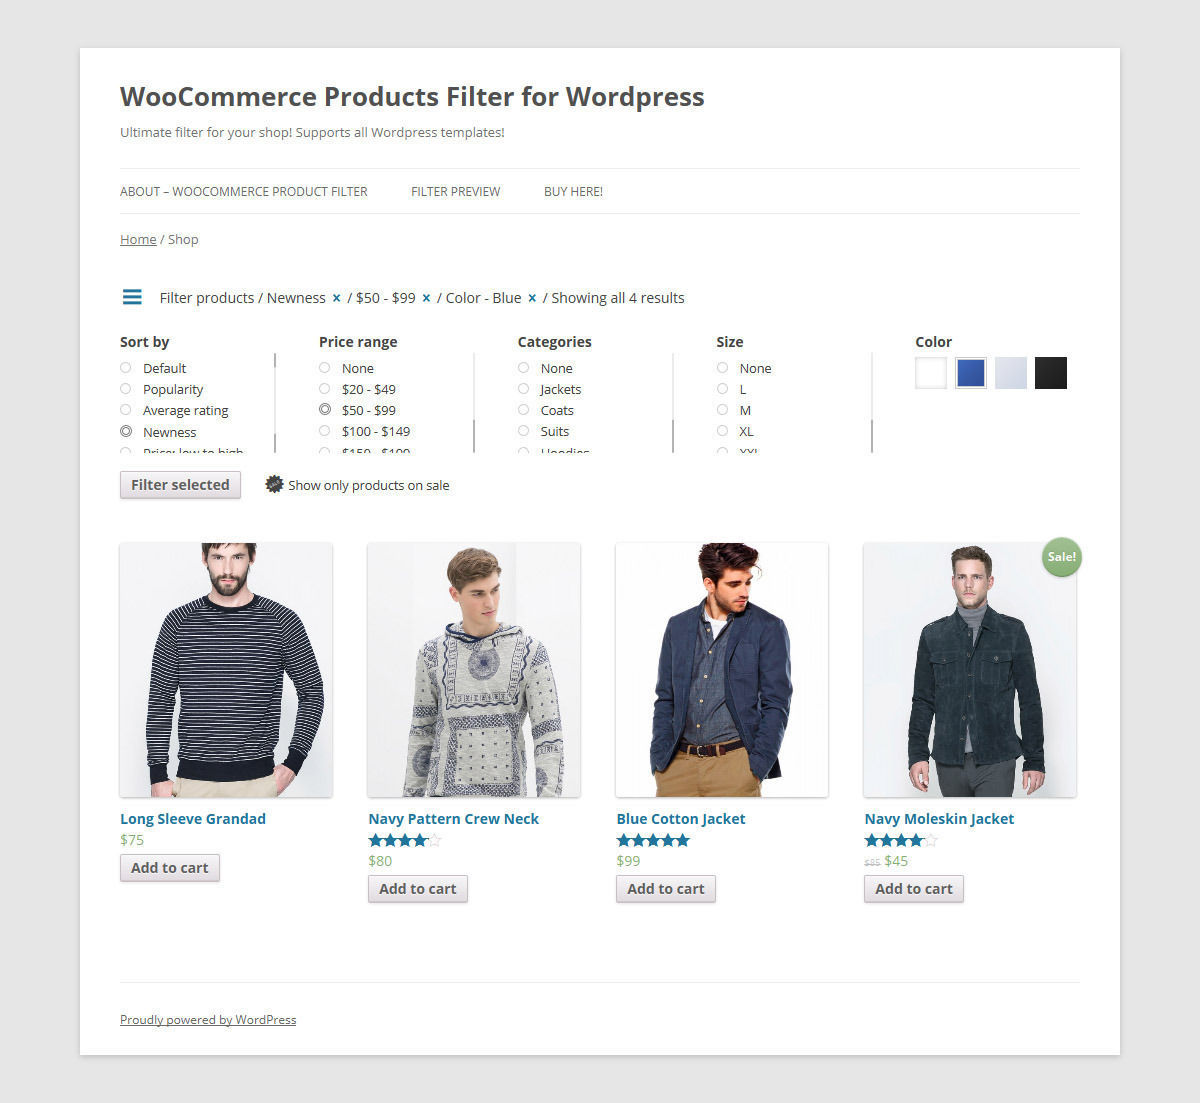 filtrar productos woocommerce